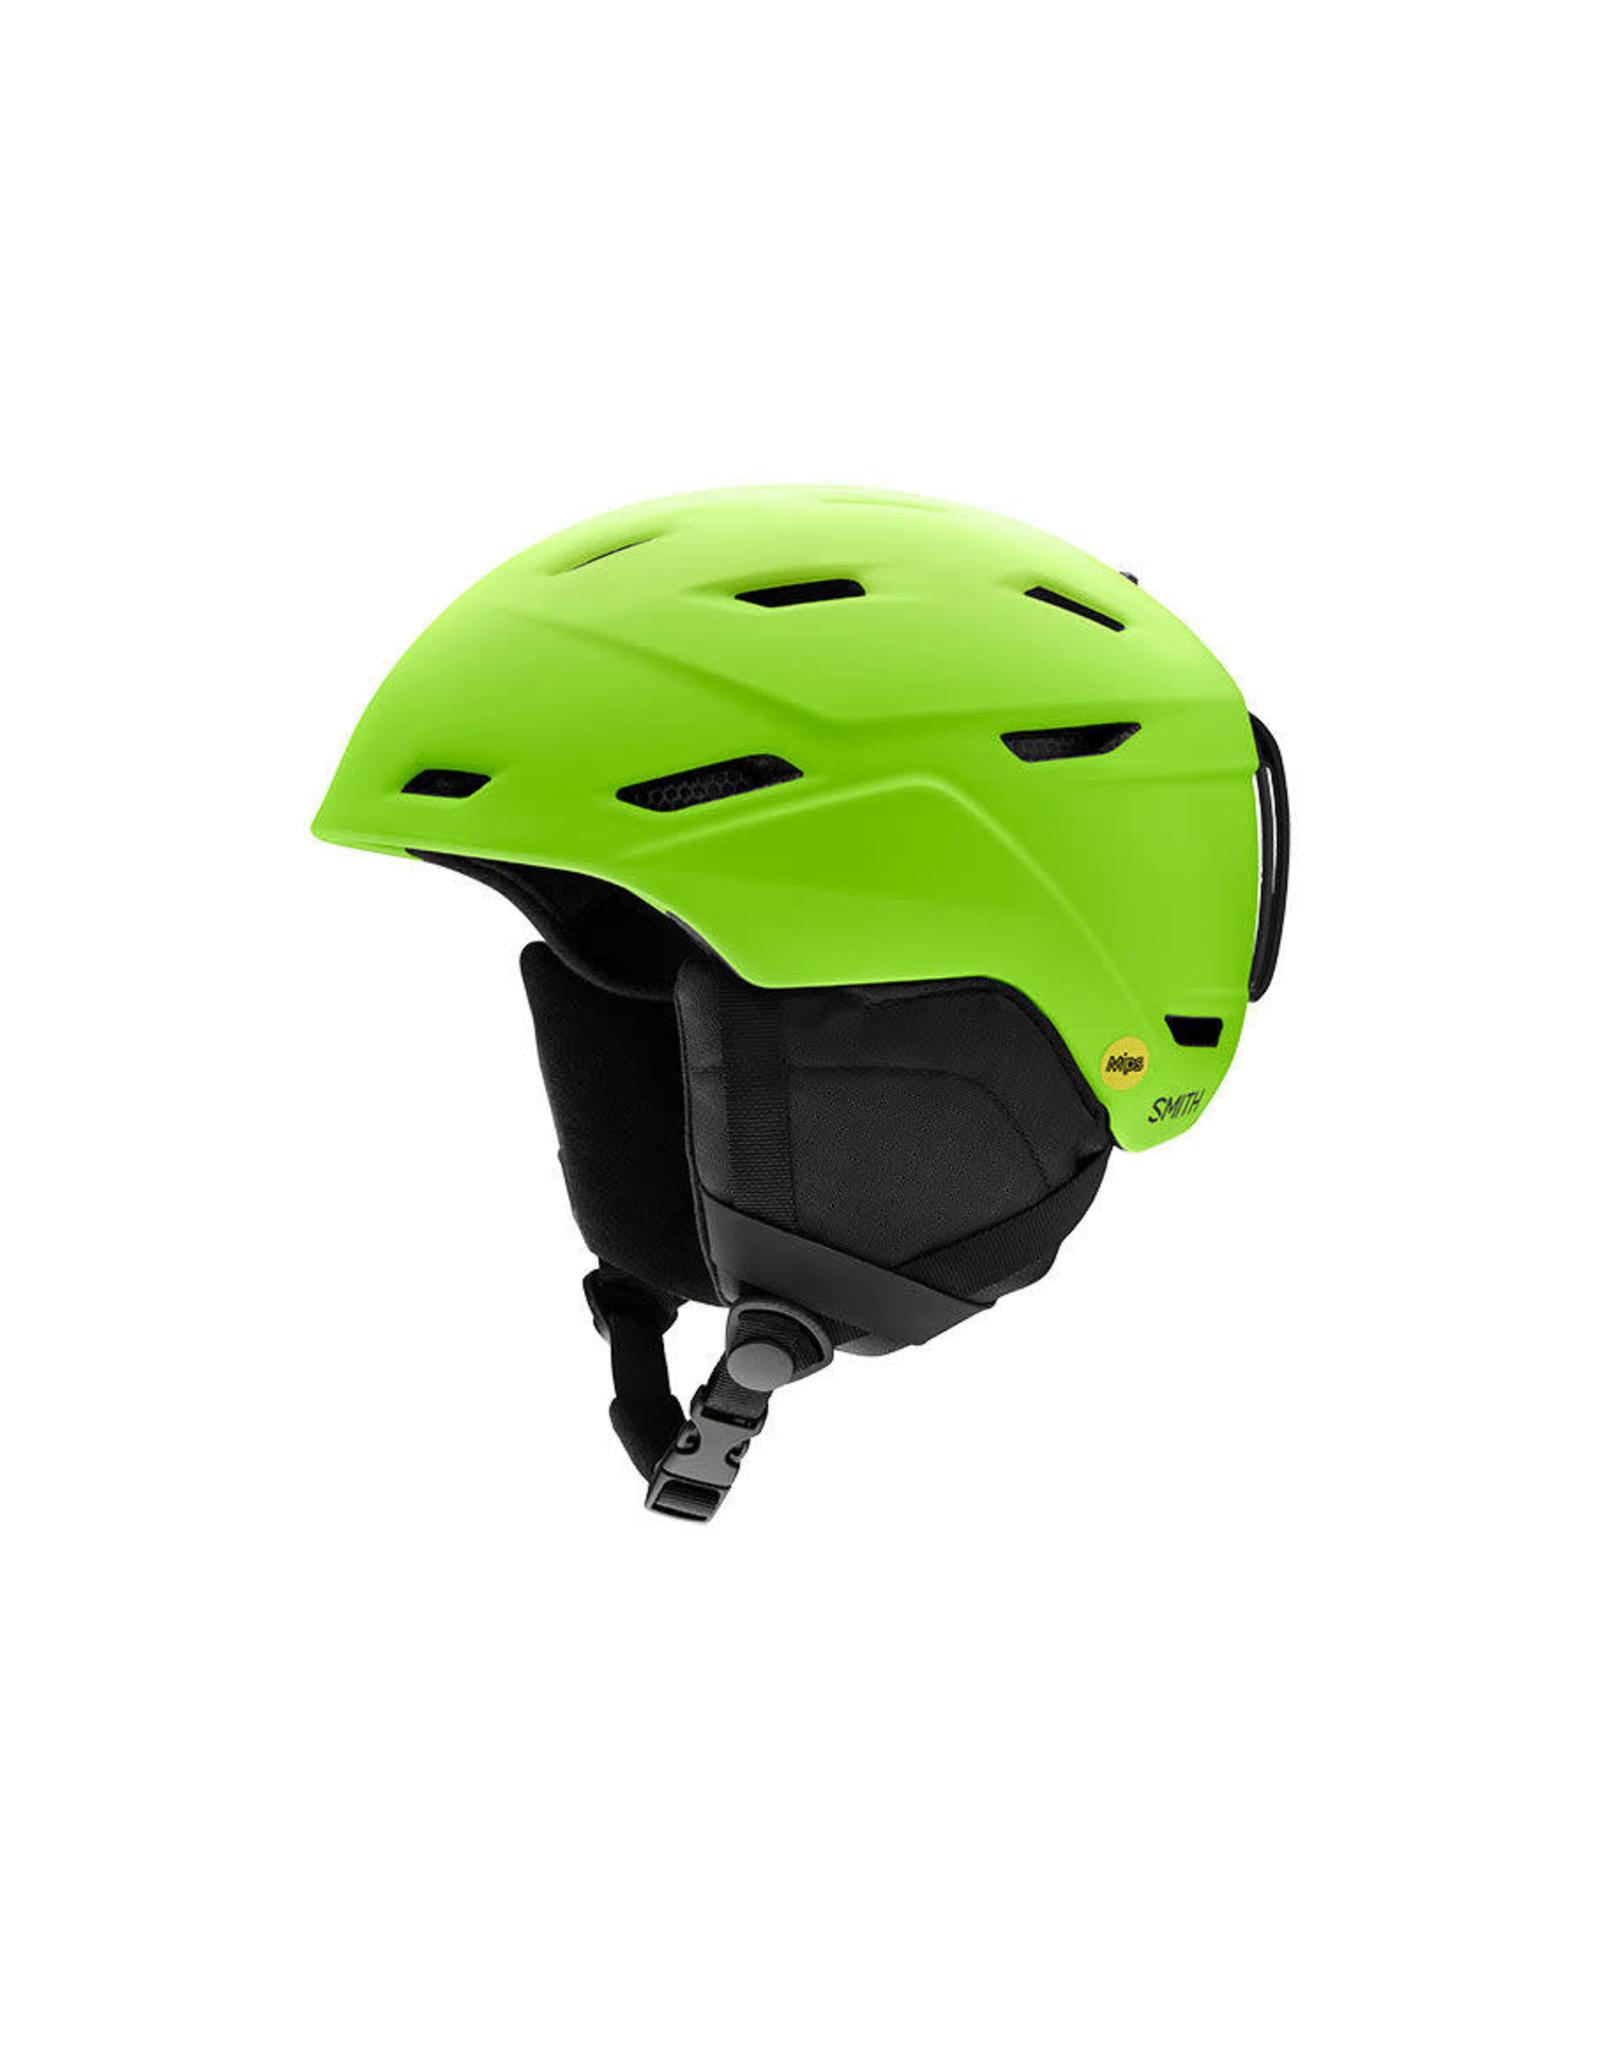 smith optics Smith Mission mips helmet - Matte limelight- Small 51-55cm